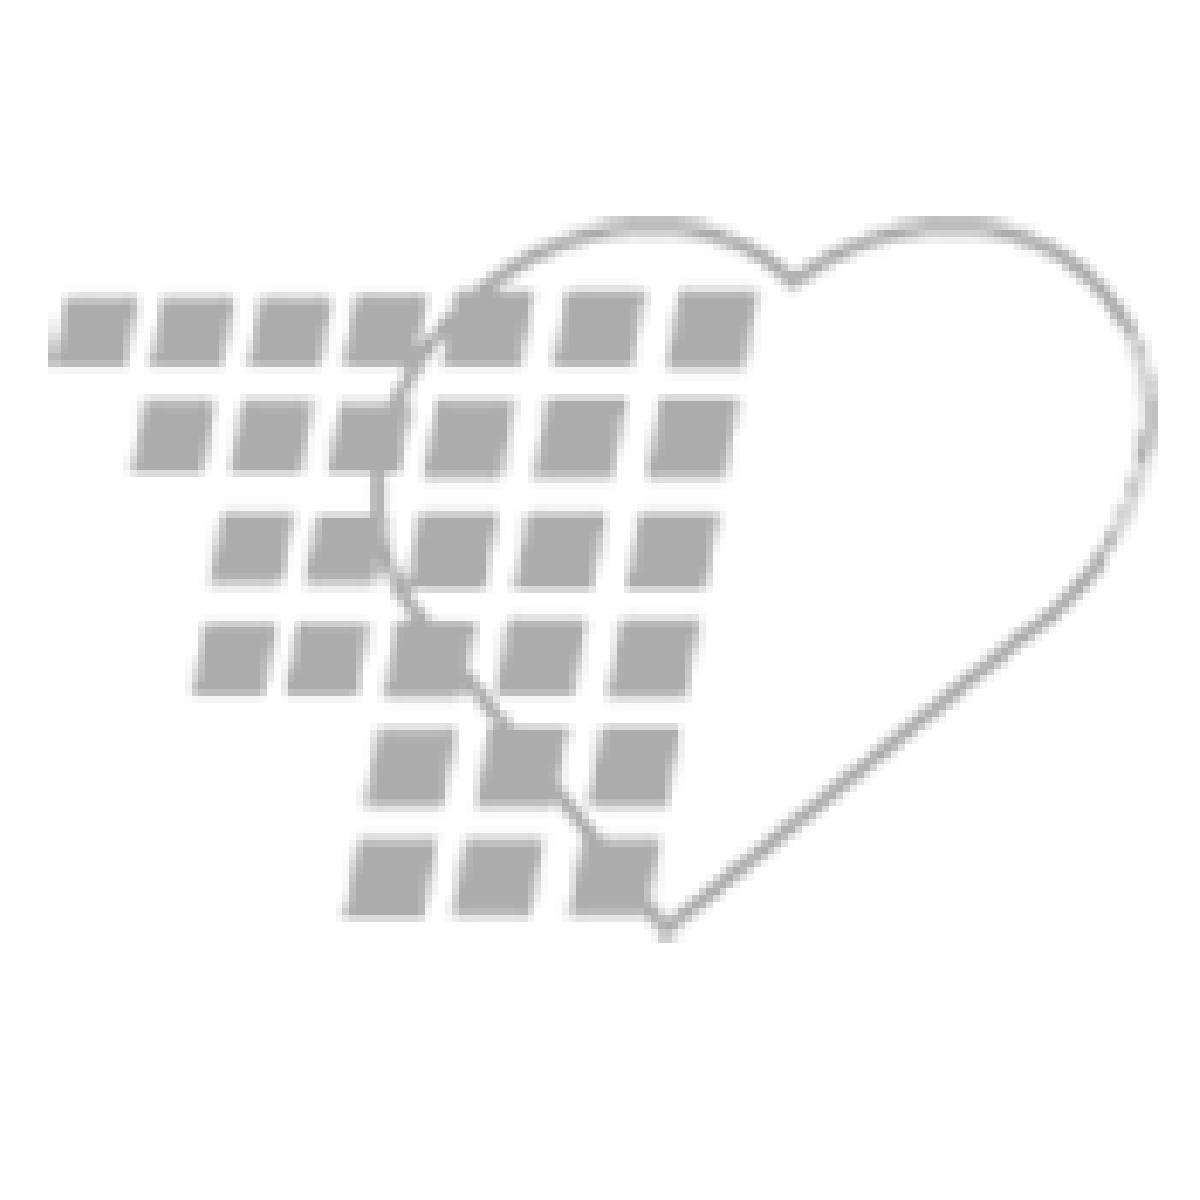 03-32-4675-FRSCNT LYSOL® Disinfectant Spray